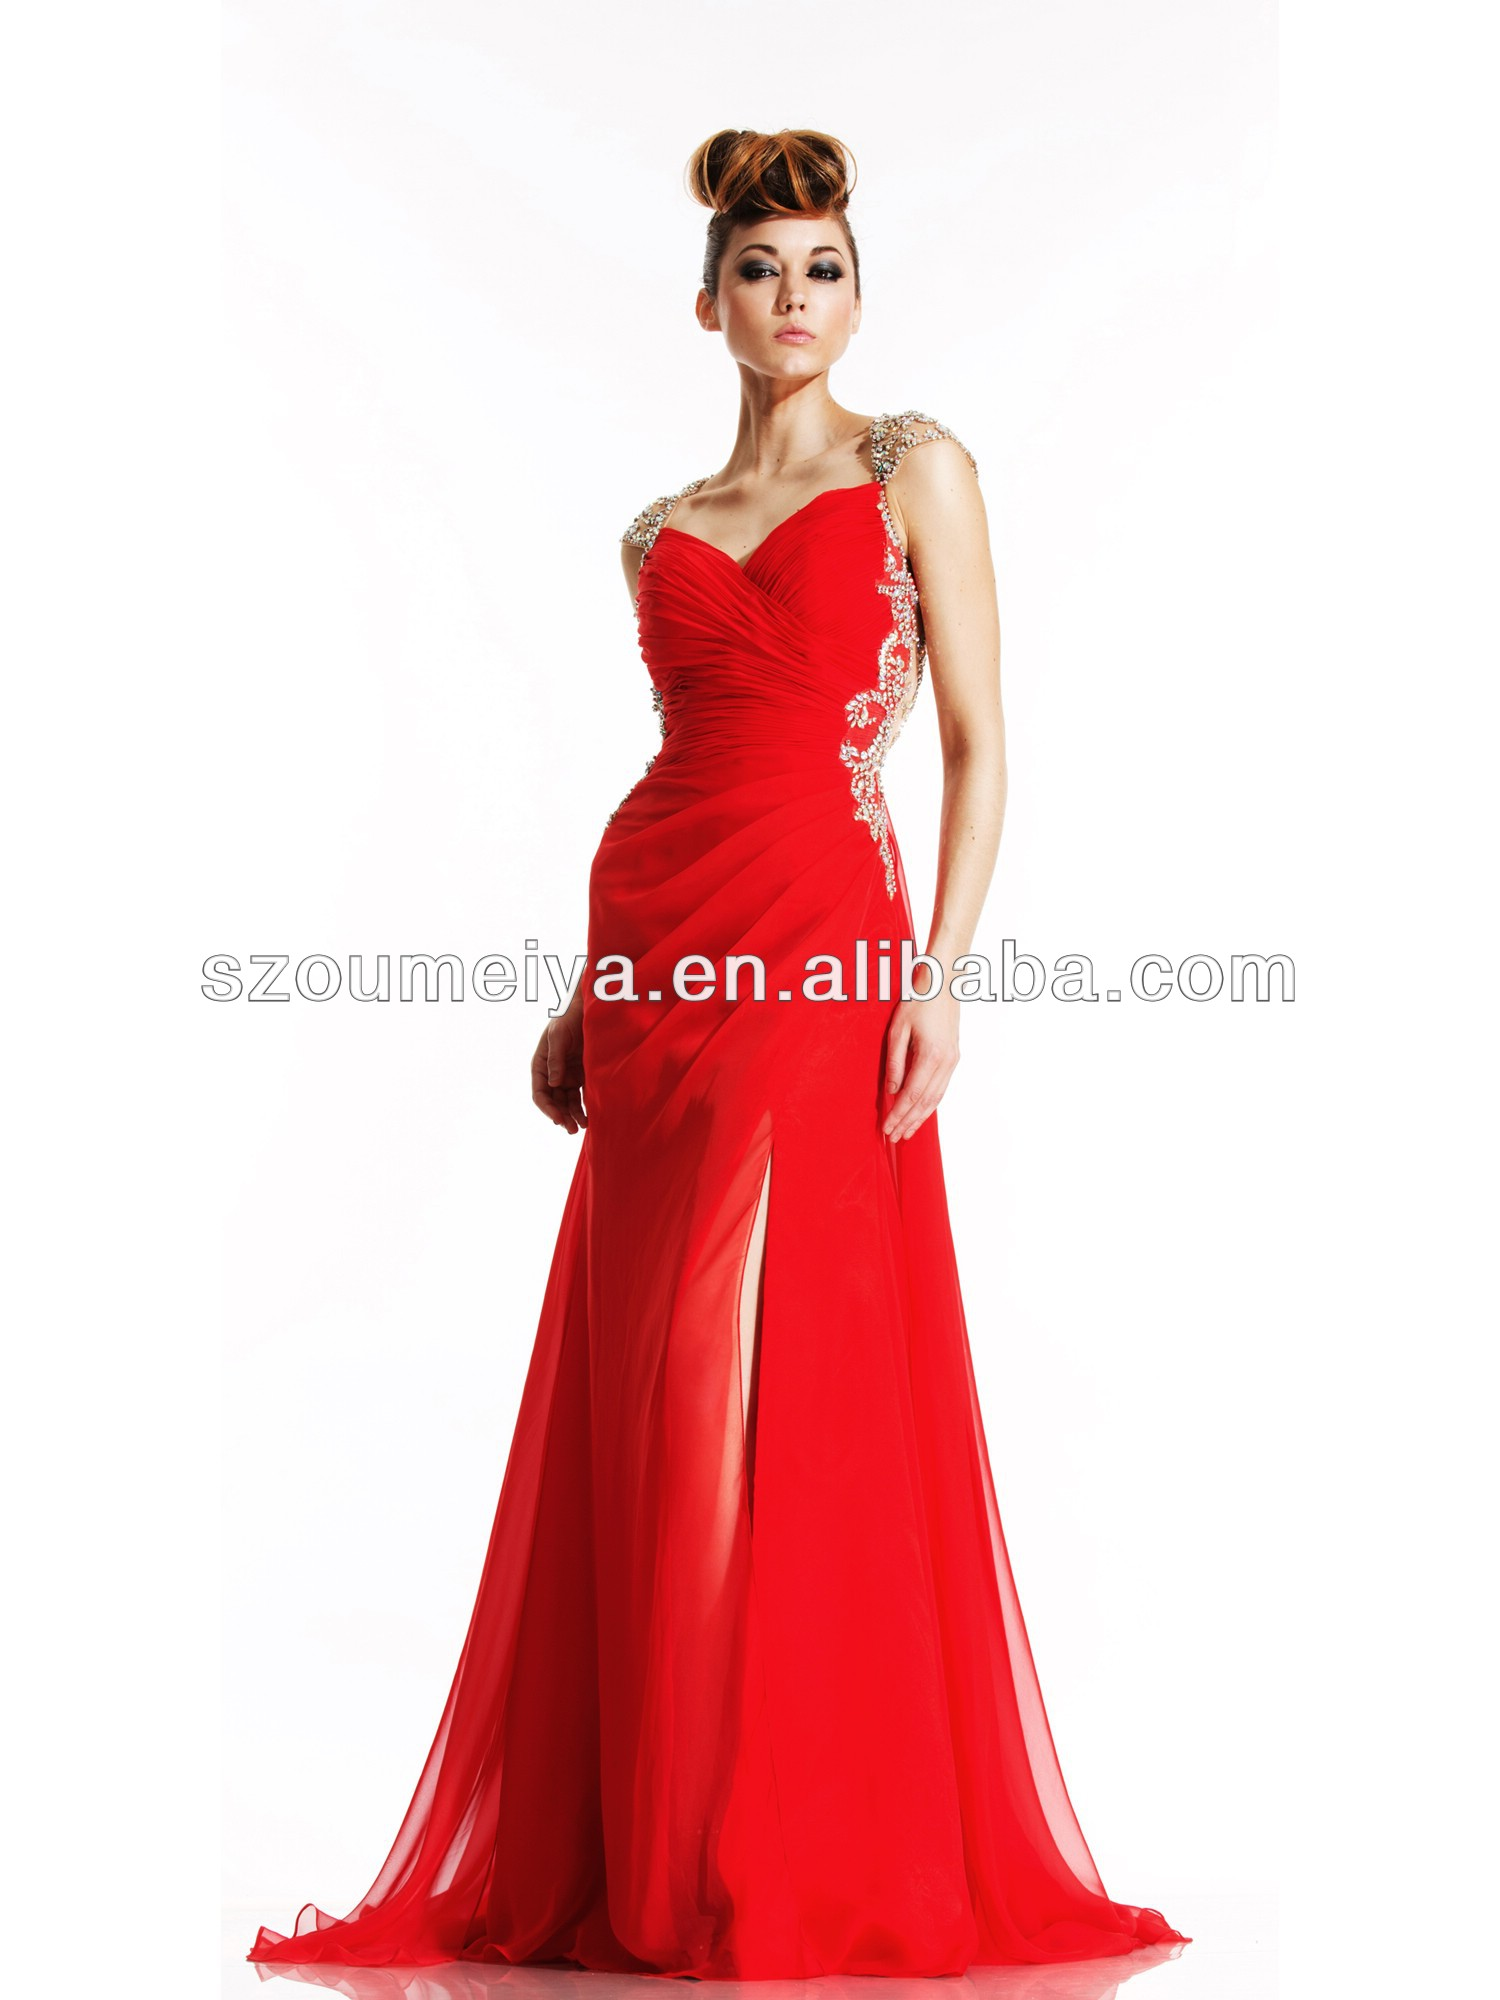 Aliexpress.com : Buy OUMEIYA OEP793 Flowy Chiffon 2014 Sexy Side ...